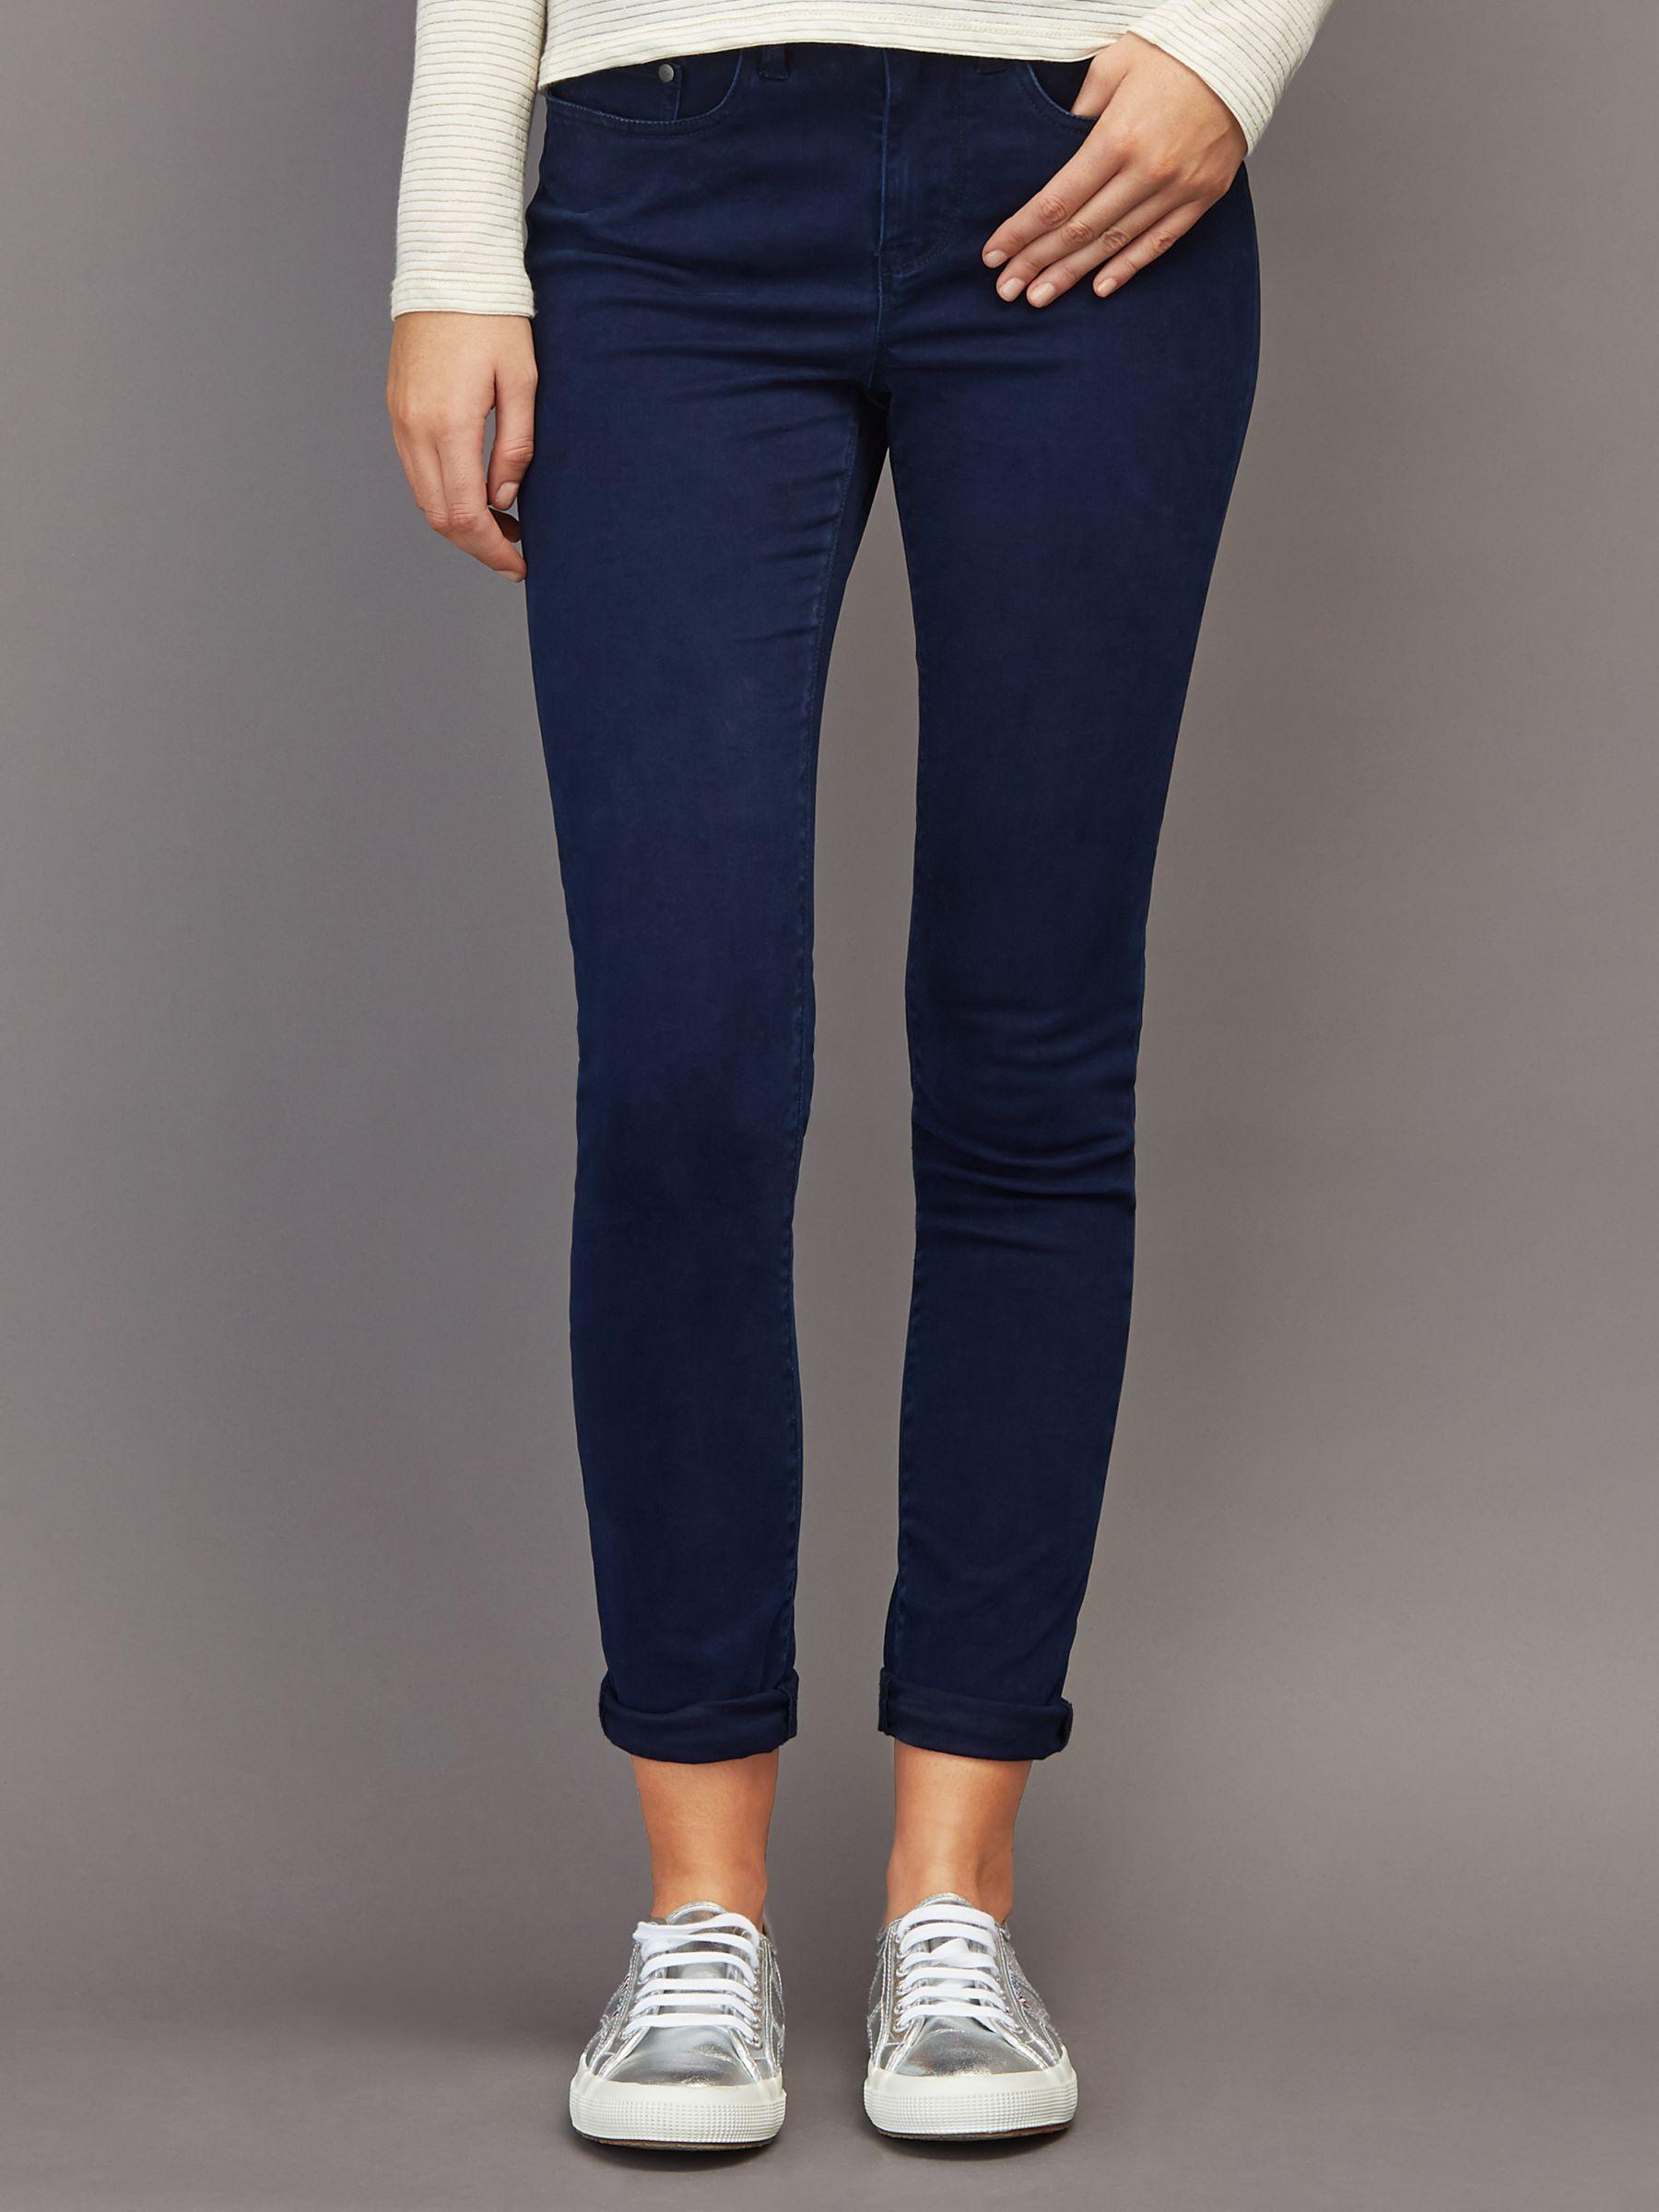 Waven Waven Asa Classic Skinny Jeans, Velvet Blue